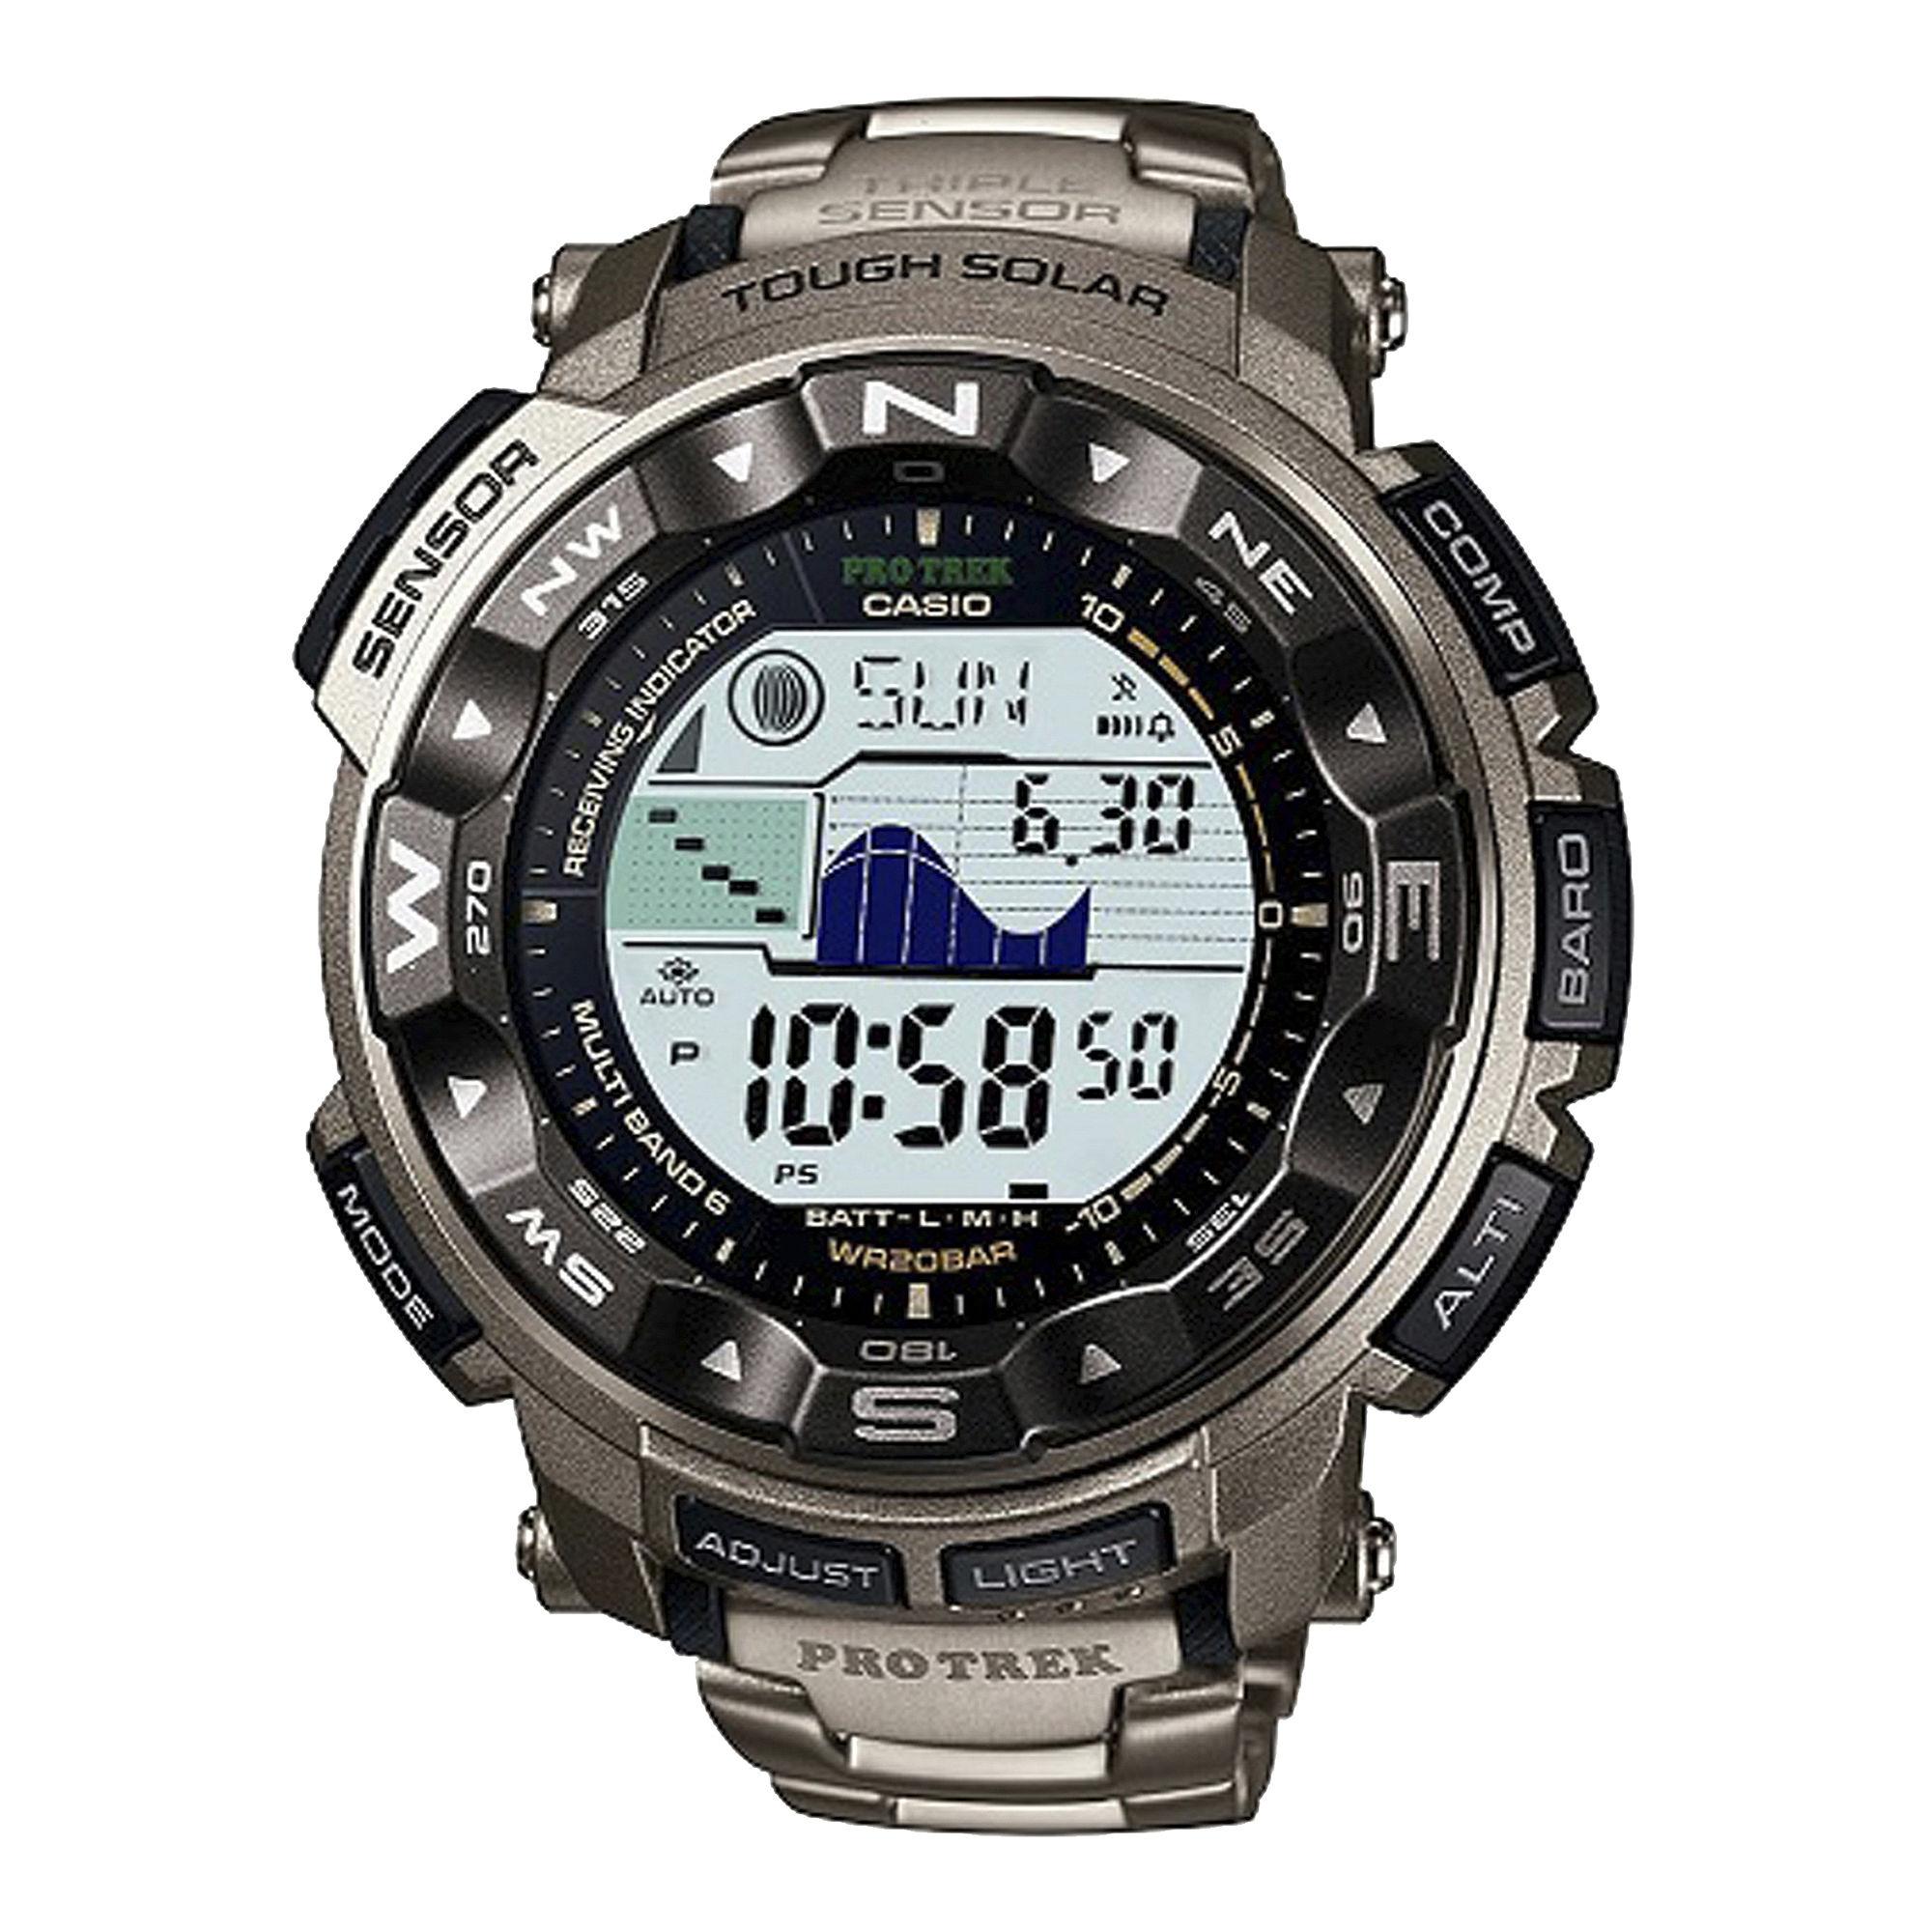 Casio Pro Trek Pathfinder Mens Triple Sensor Titanium Watch PRW2500T-7CR